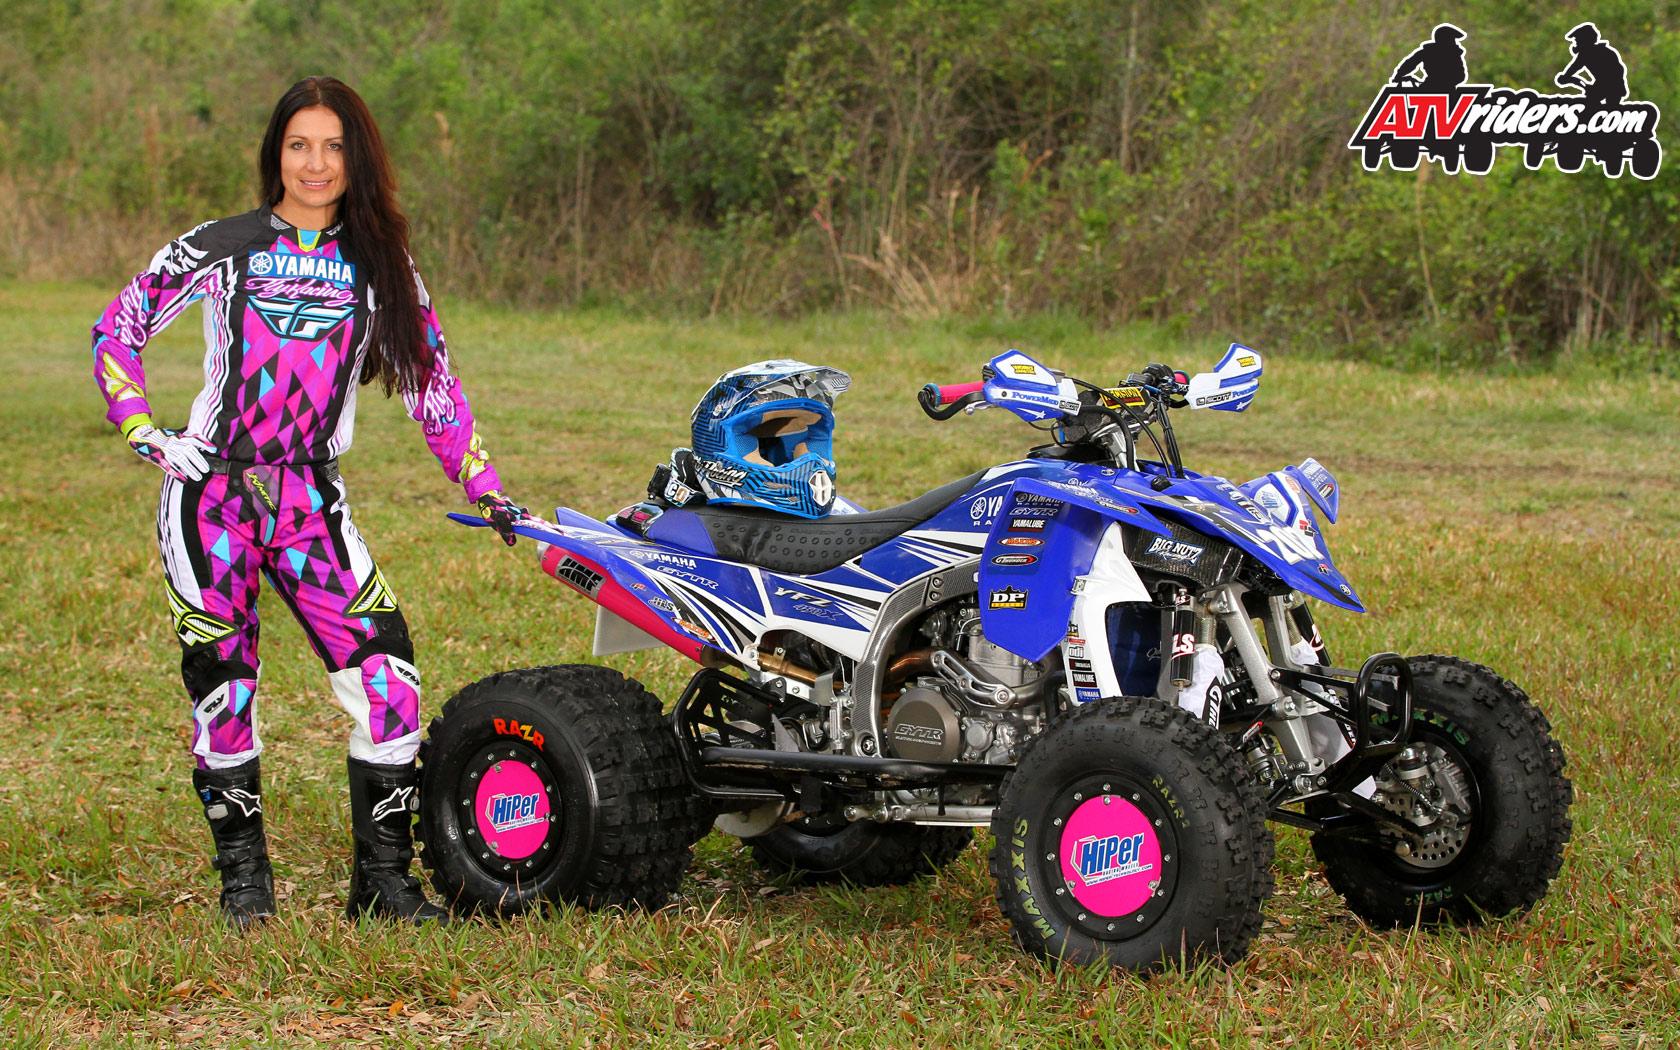 Traci Cecco 8x Women S Gncc Champion Yamaha Yfz450r Atv